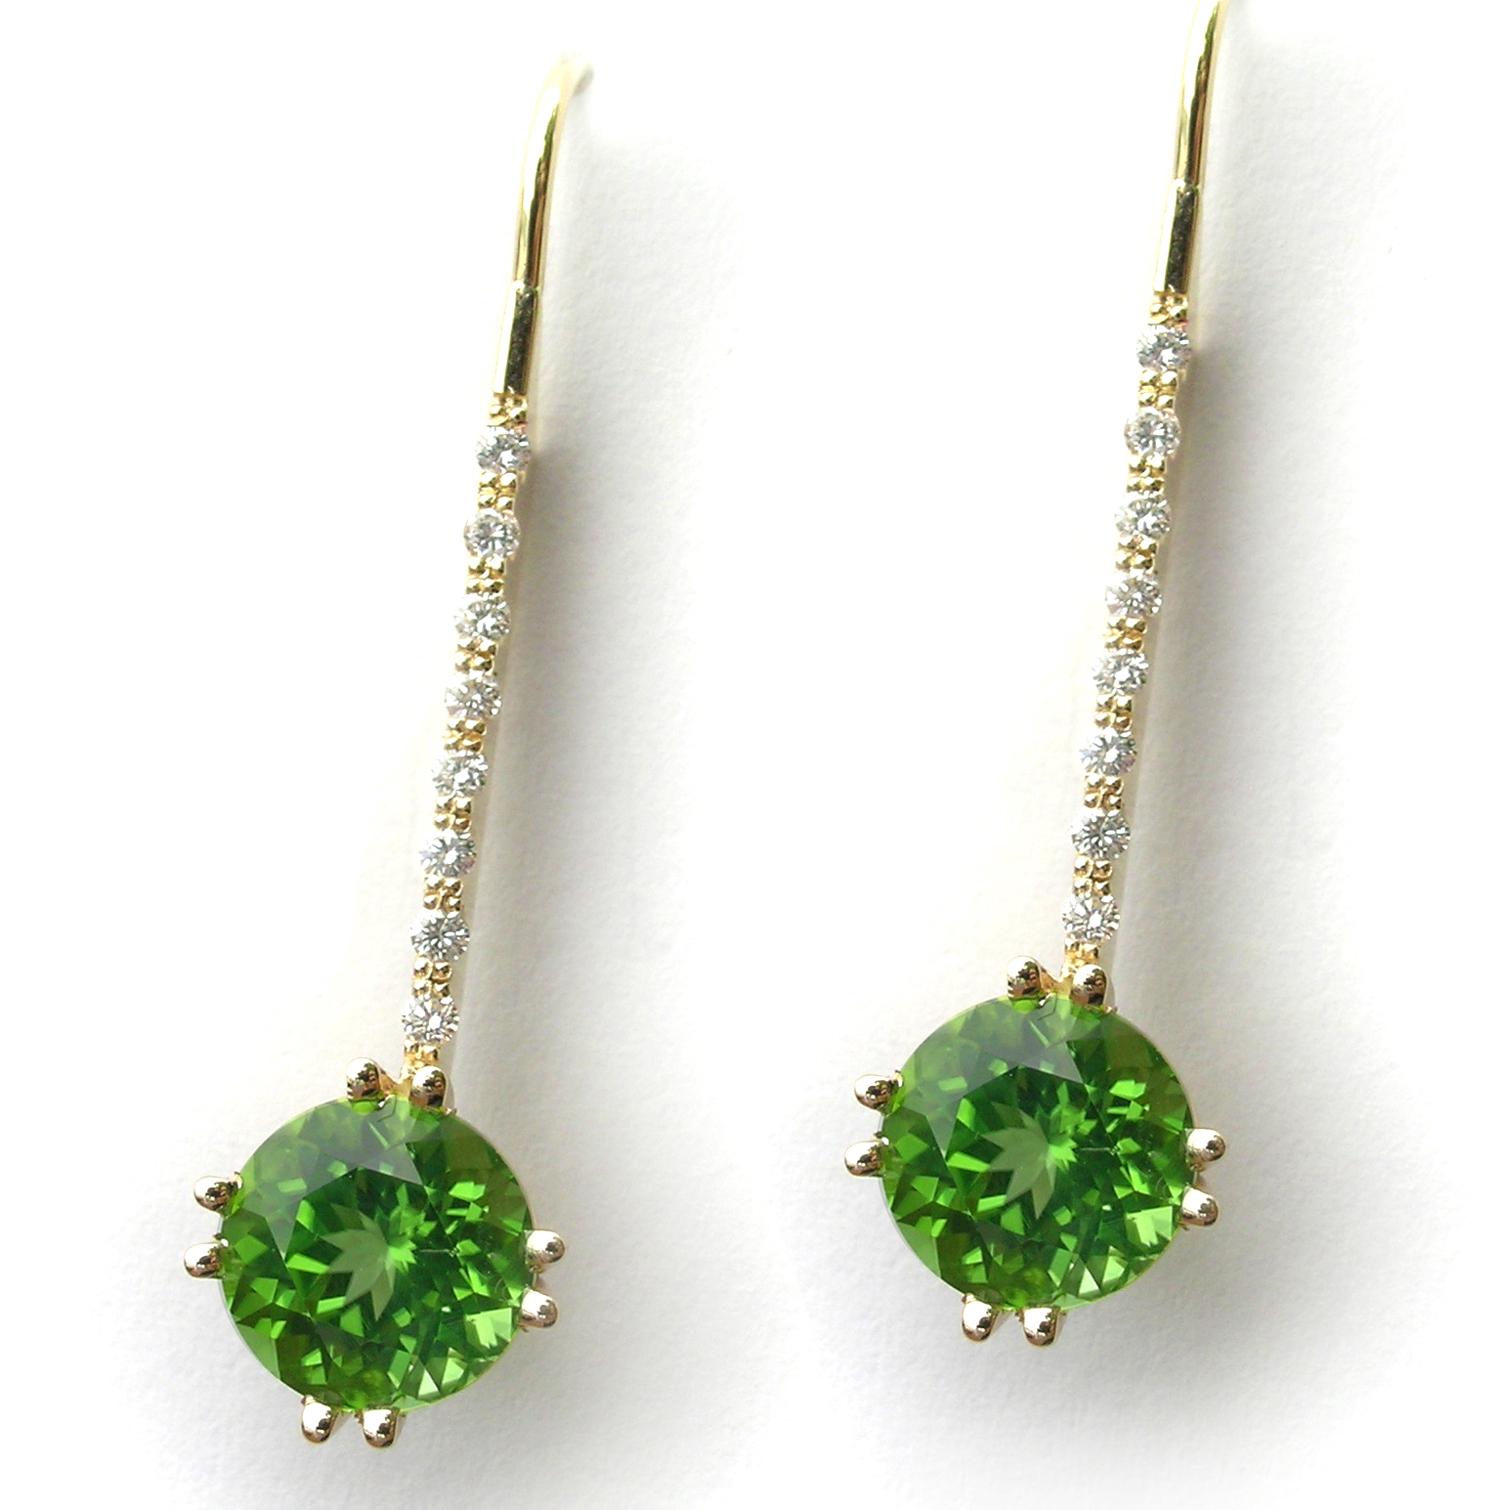 Peridot and Diamond custom earrings designed by Jason Baskin at The Gem Vault